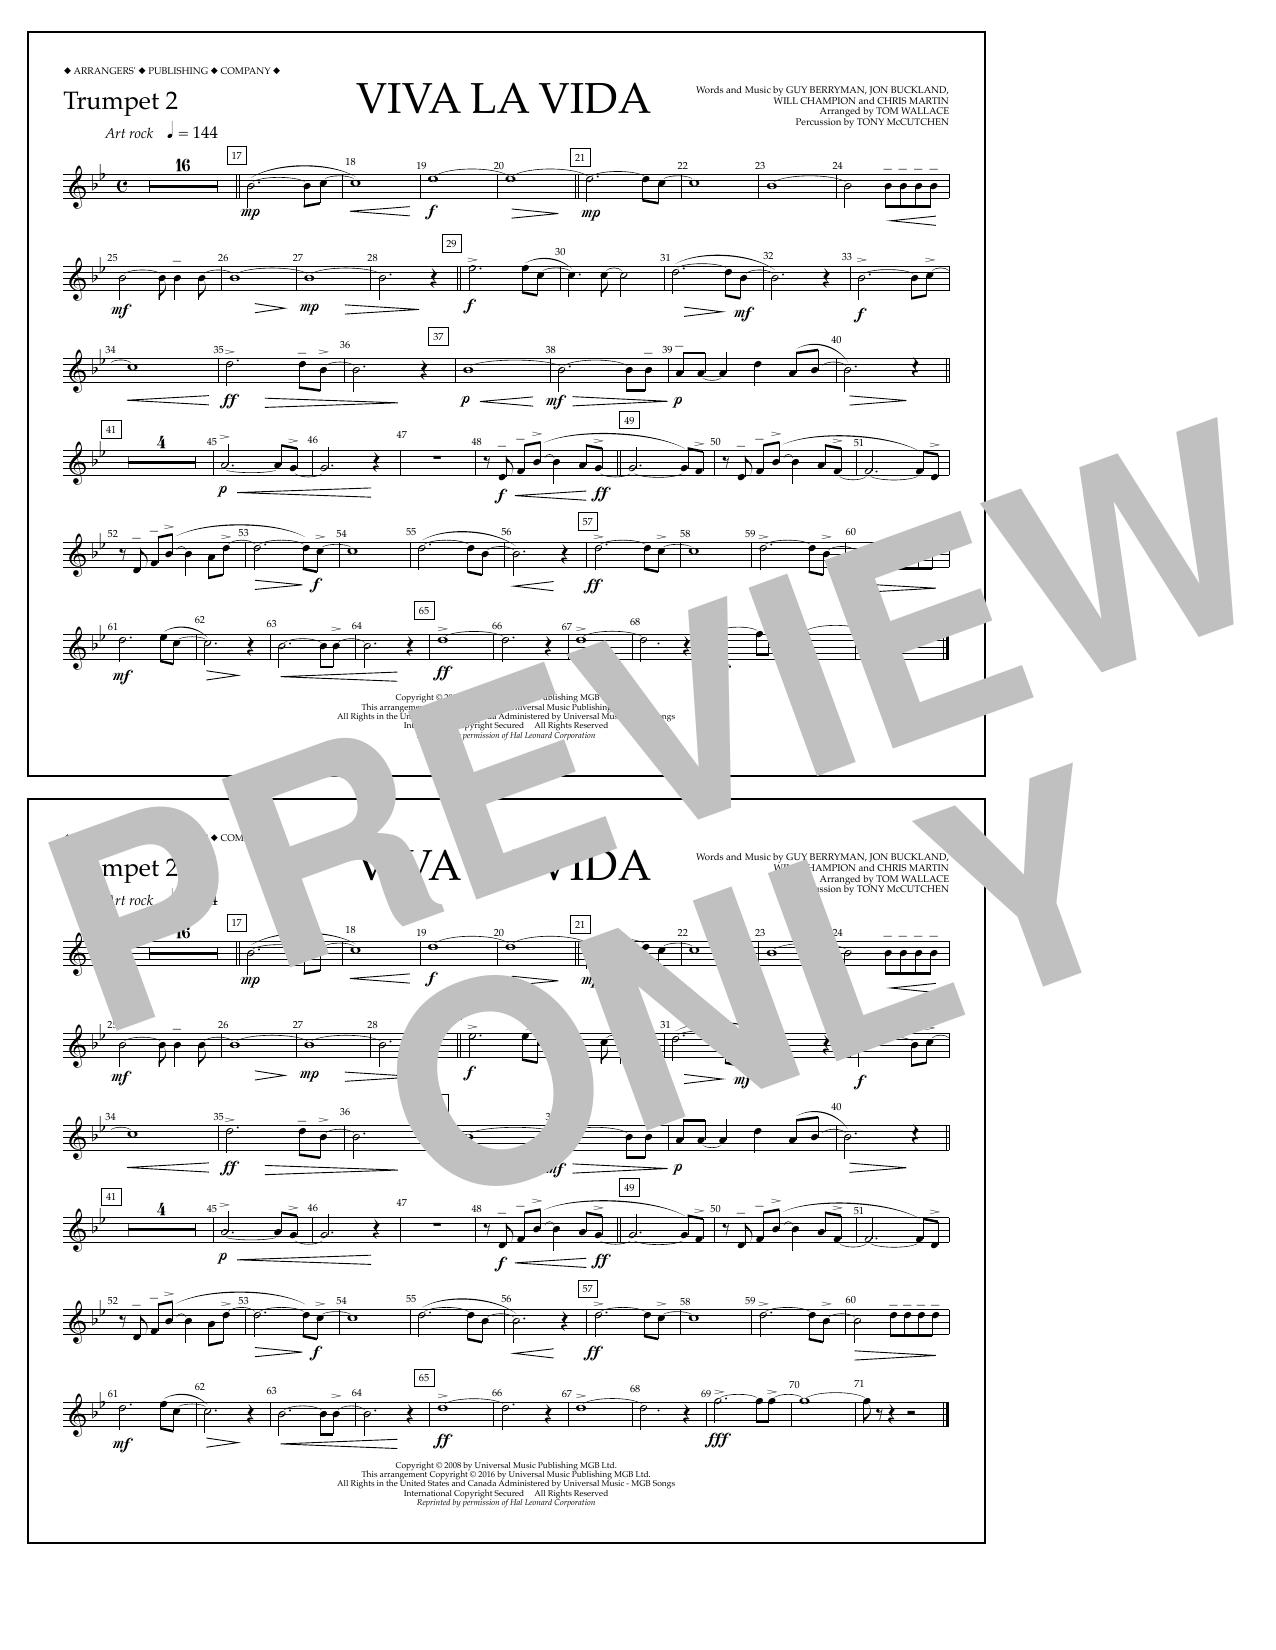 Coldplay - Viva La Vida - Trumpet 2